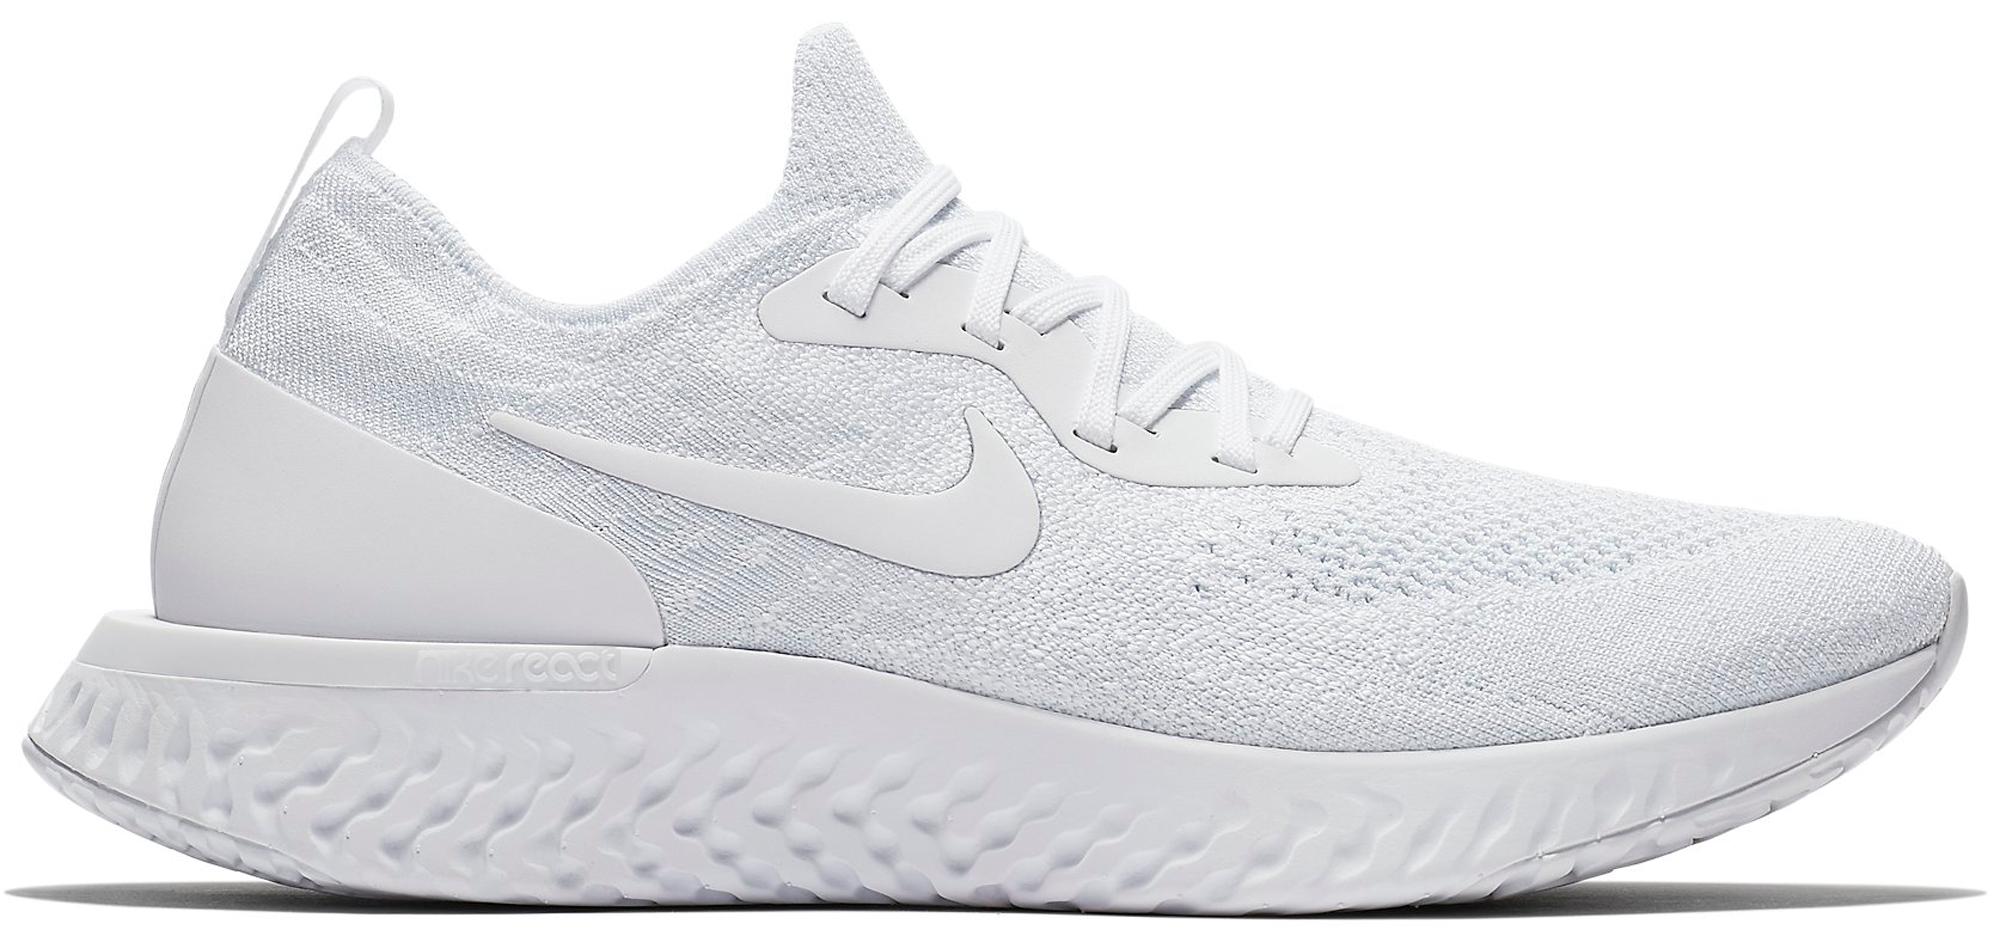 Nike Epic React Flyknit True White